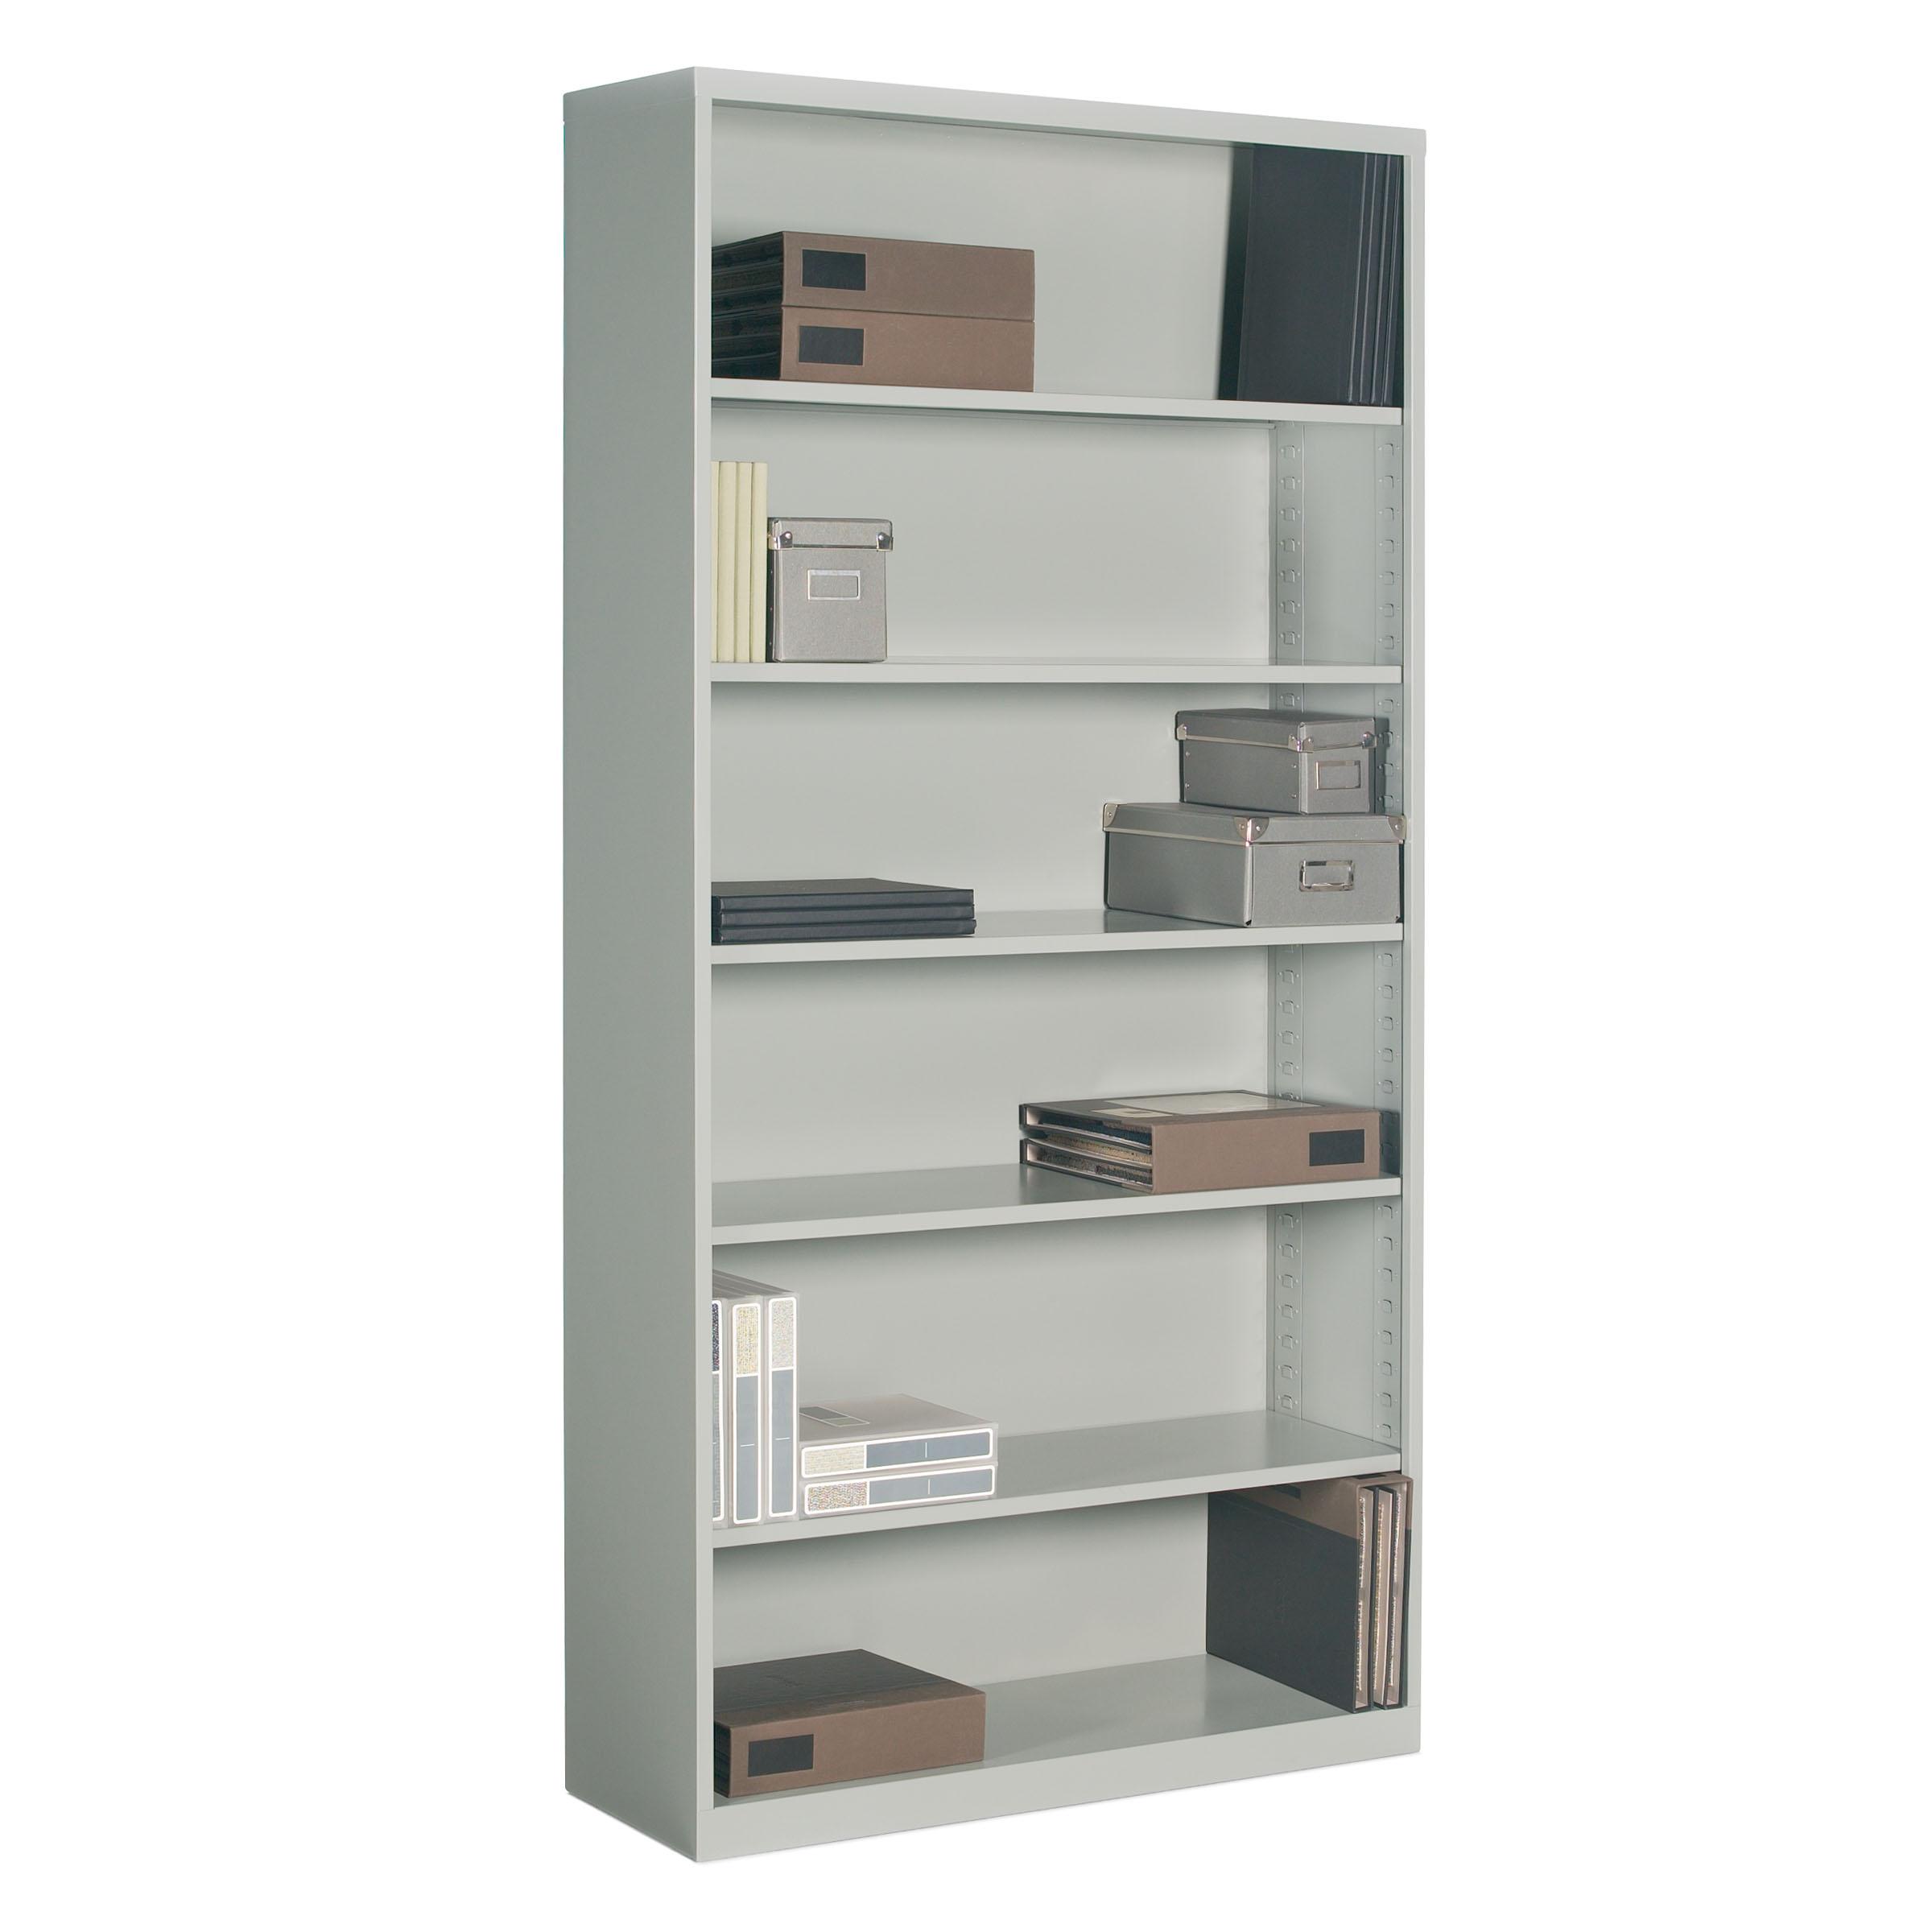 Metal bookcase low 383.61k |  high 200.82k LGMZTEC